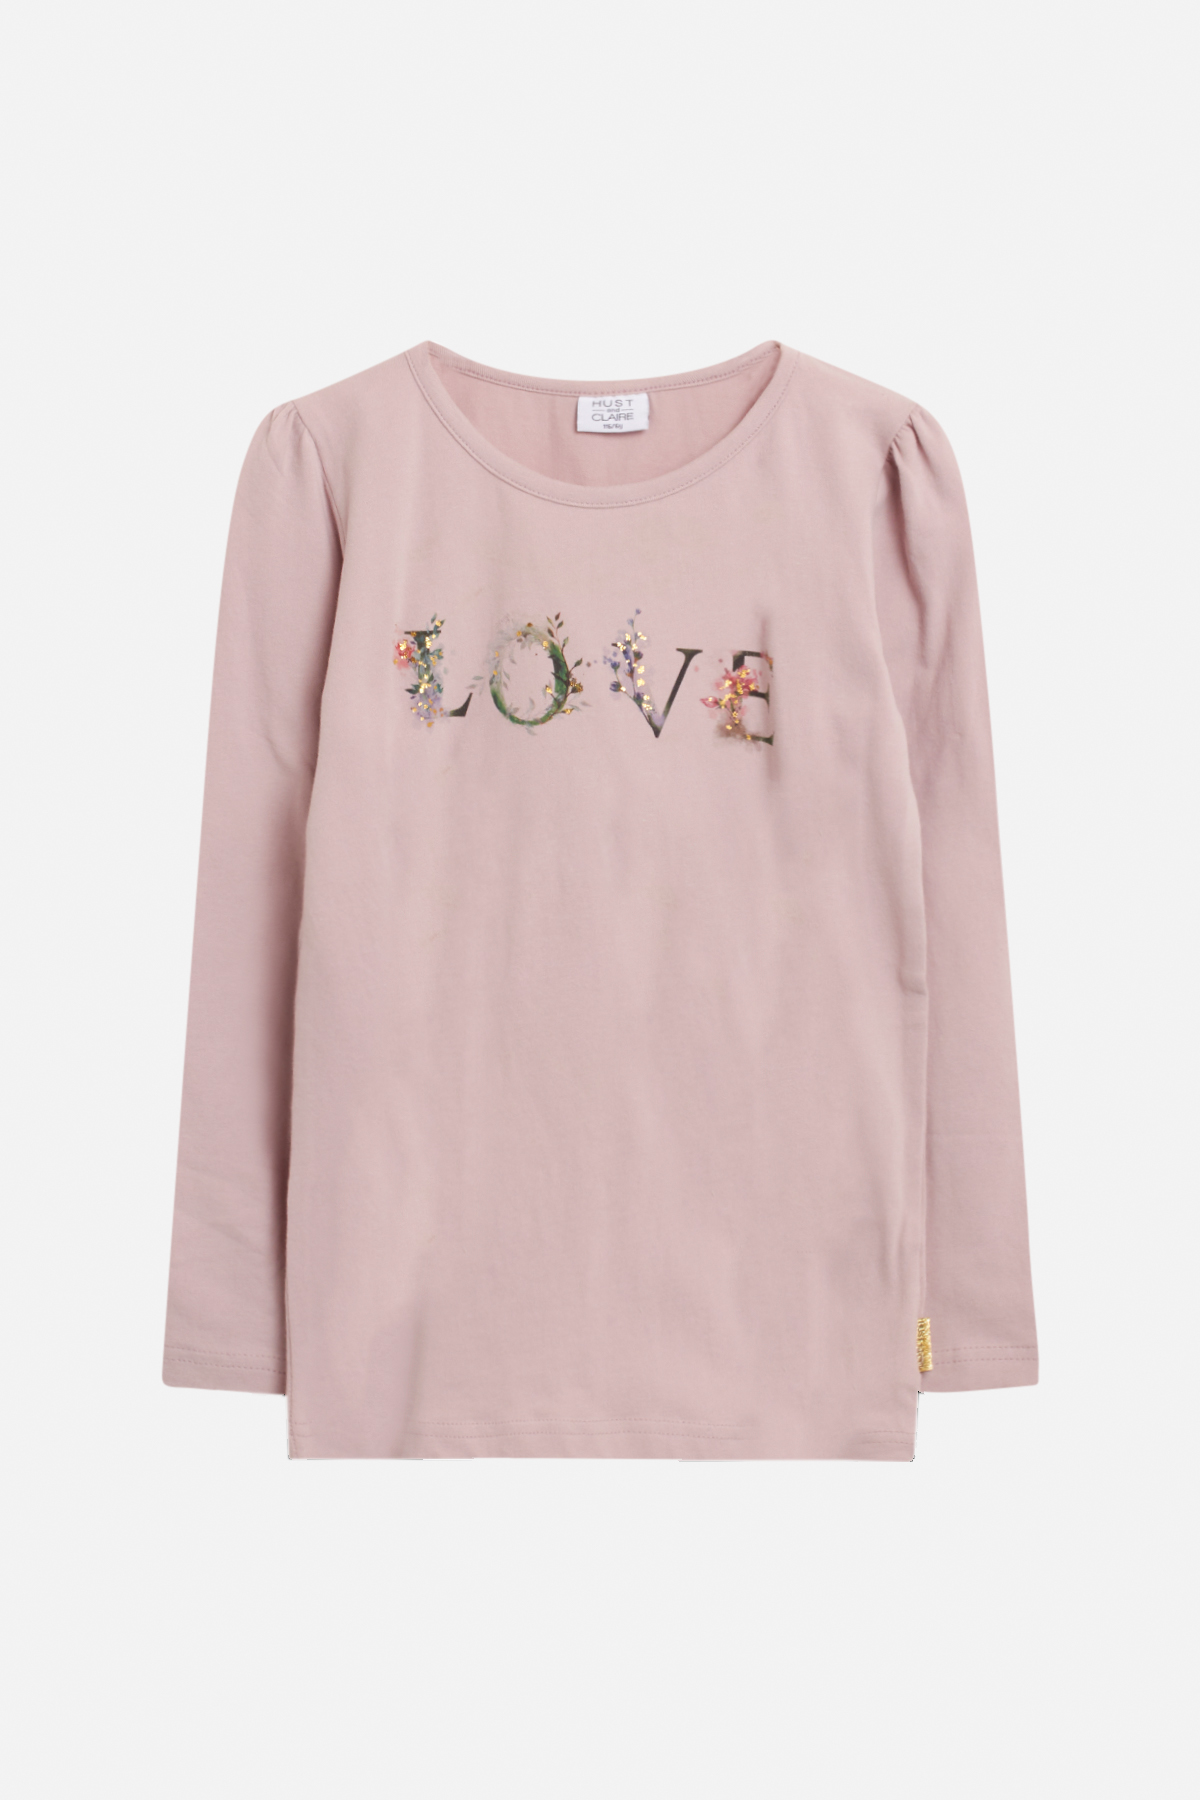 Girl - Annsofi - T-shirt L/S